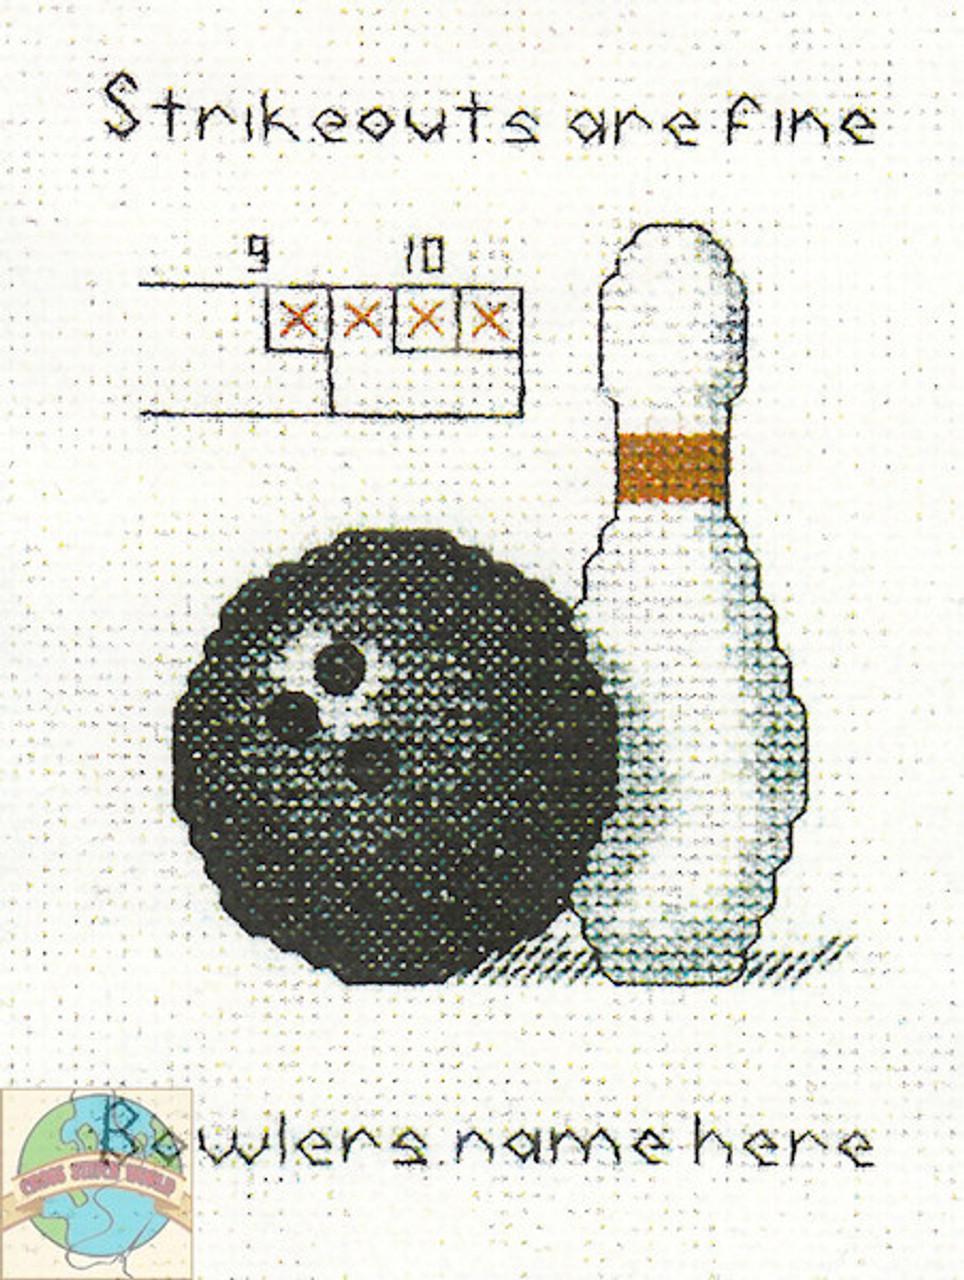 Hilite Designs - Bowling Emblem